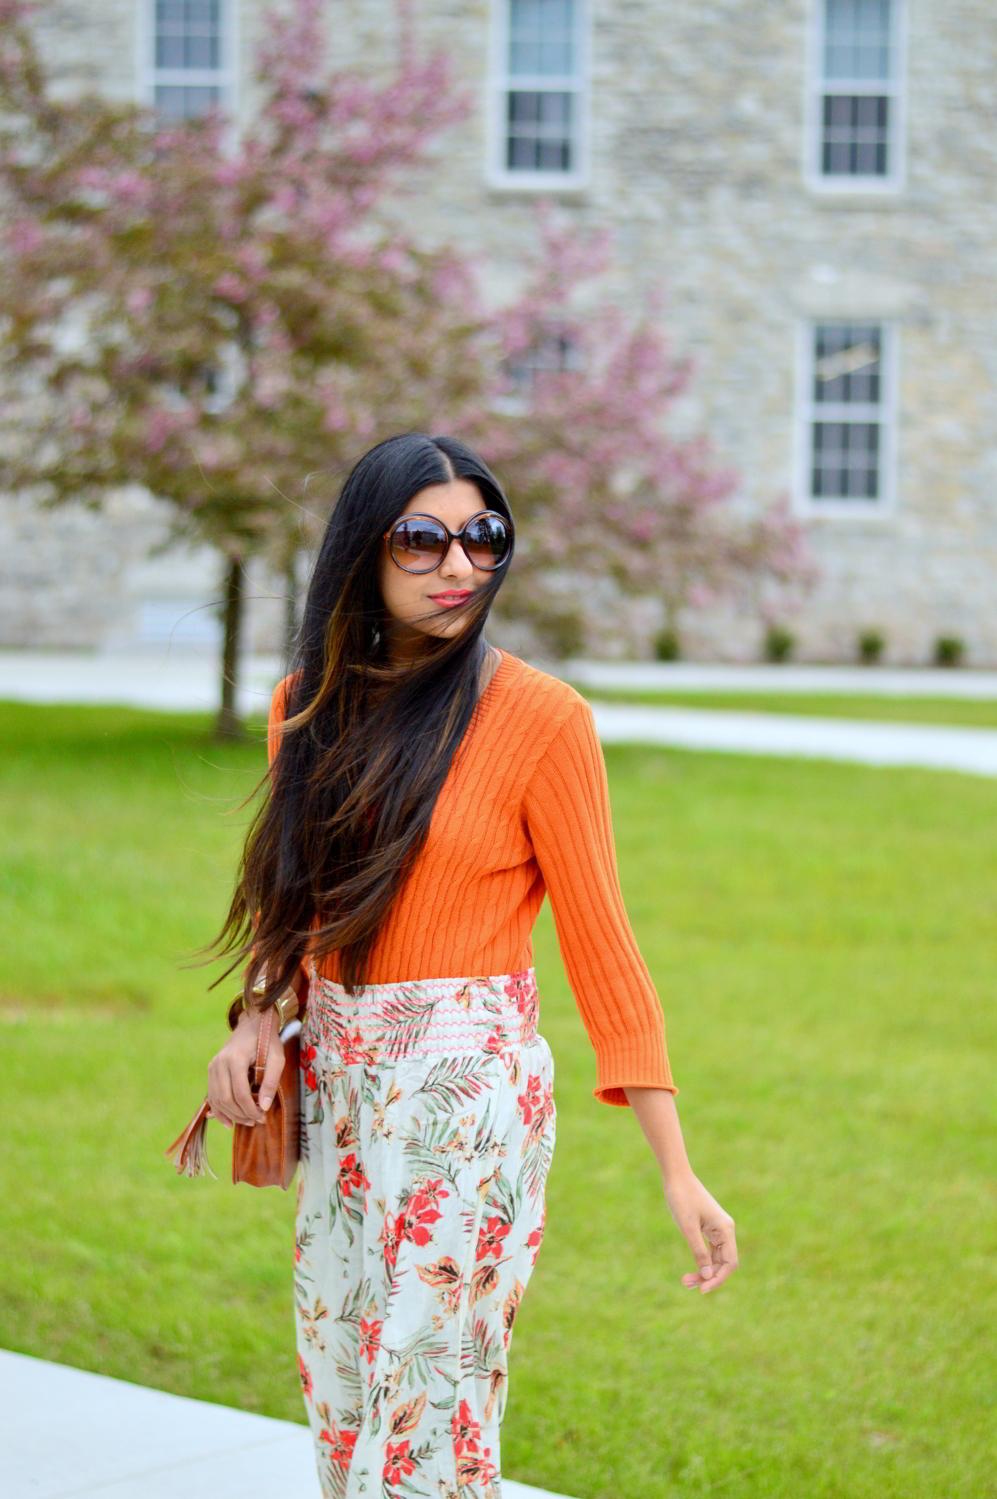 loral-wide-leg-pants-beach-coverup-orange-sweater 2